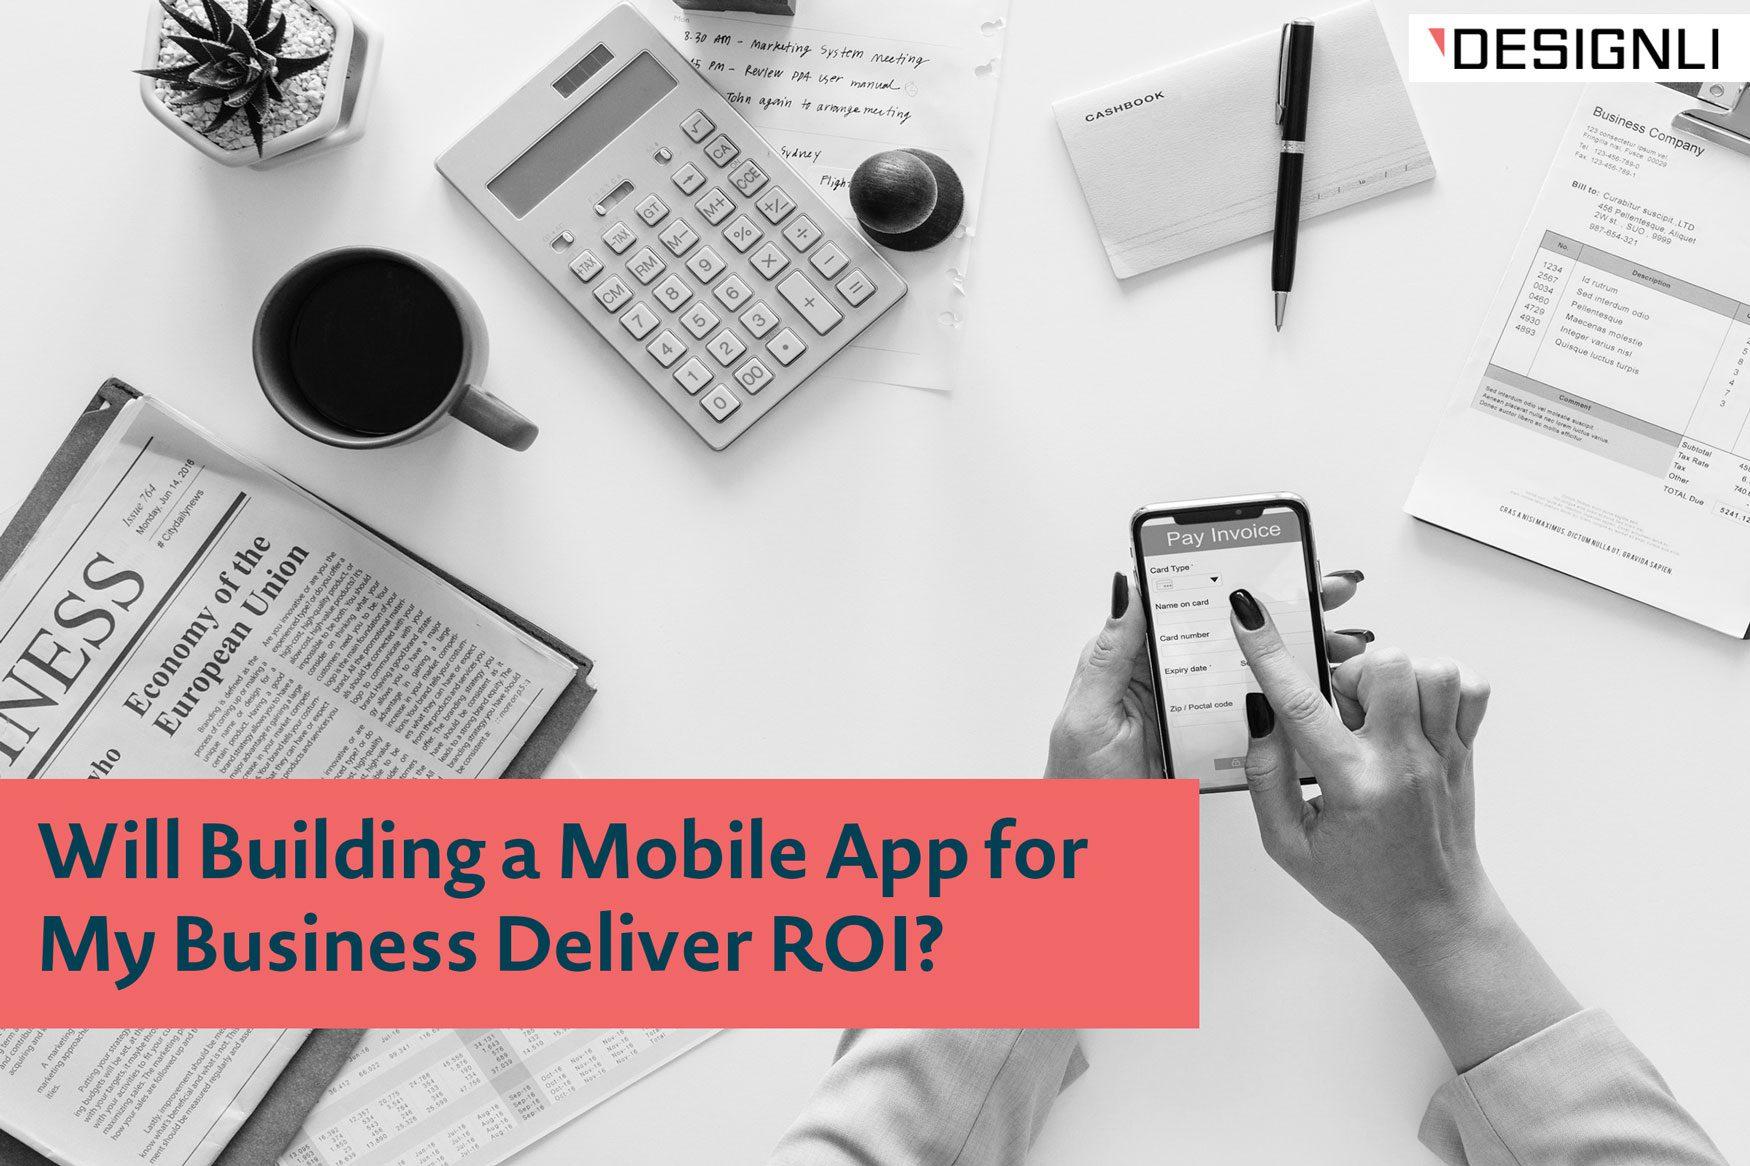 mobile app ROI